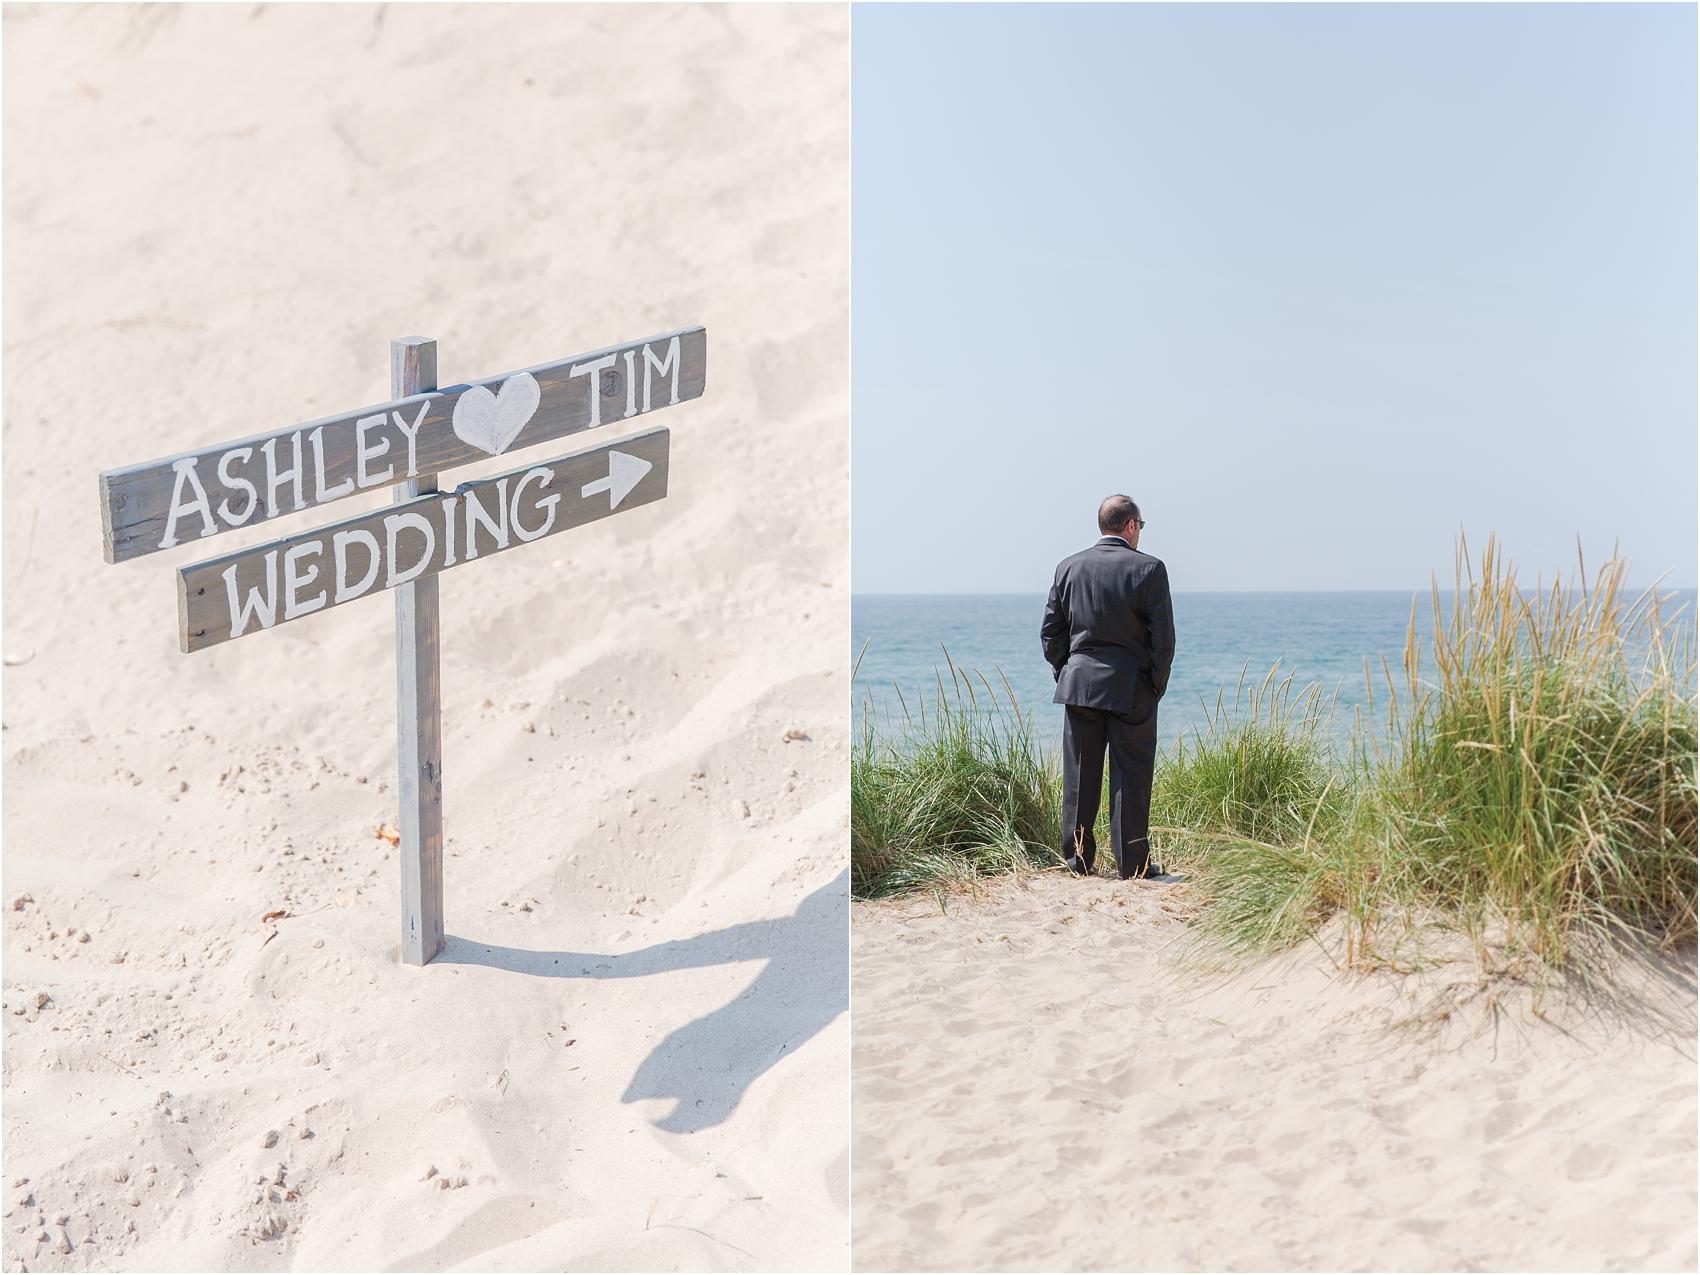 fun-whimsical-beach-wedding-photos-in-st-joseph-michigan-by-courtney-carolyn-photography_0058.jpg